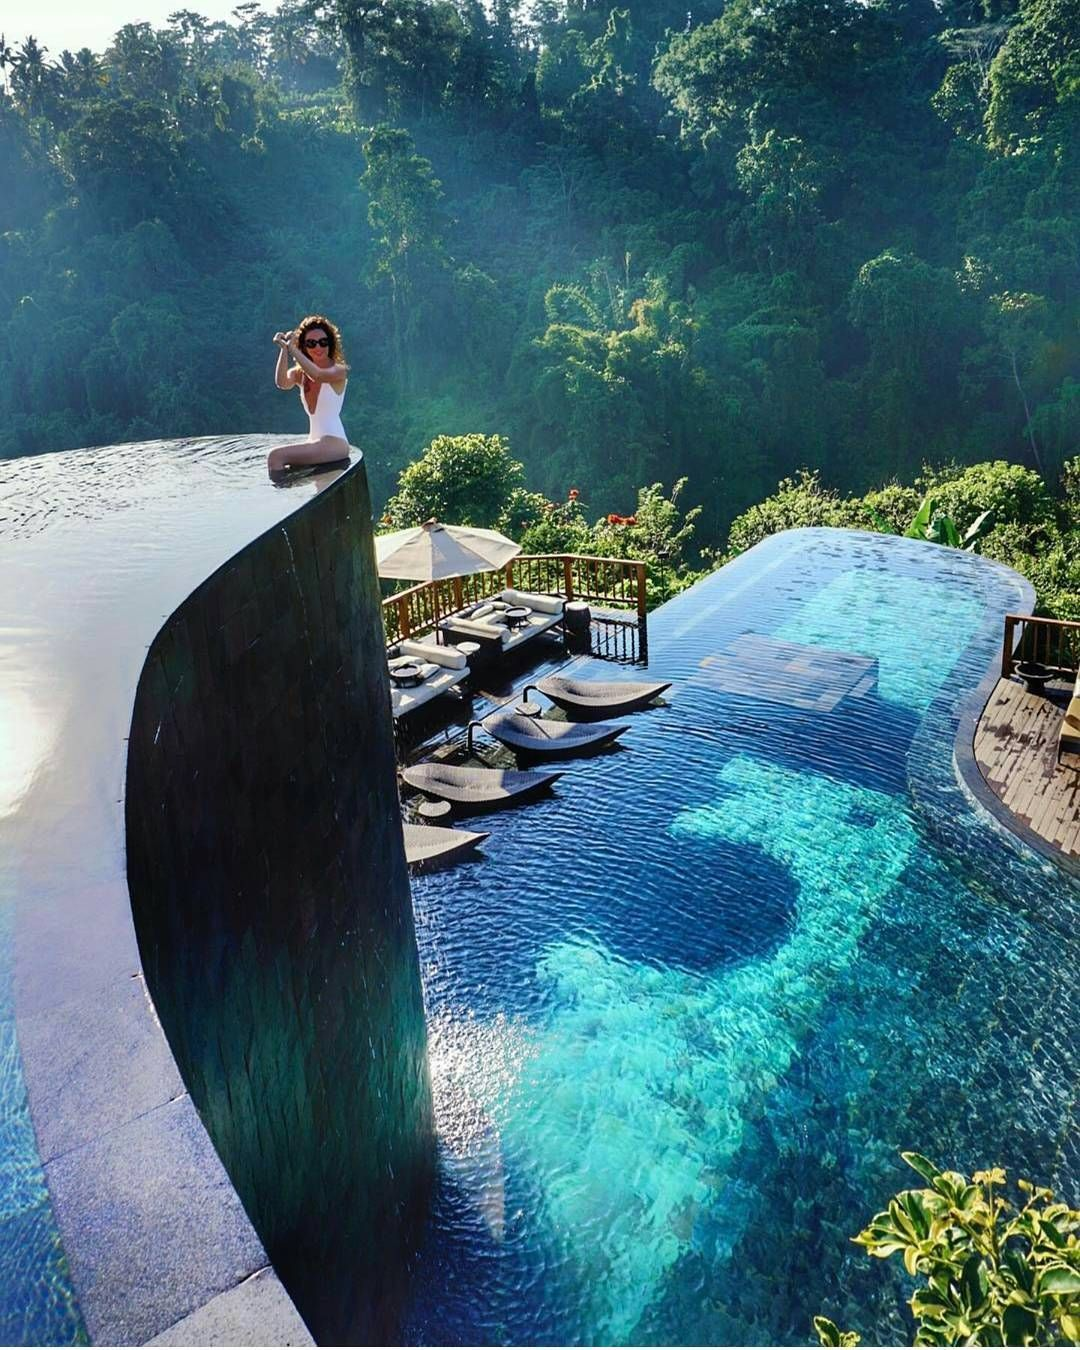 fdc95987775c32f4dd71c714068b36b6 - Hanging Gardens Of Bali Instagrammable Bali